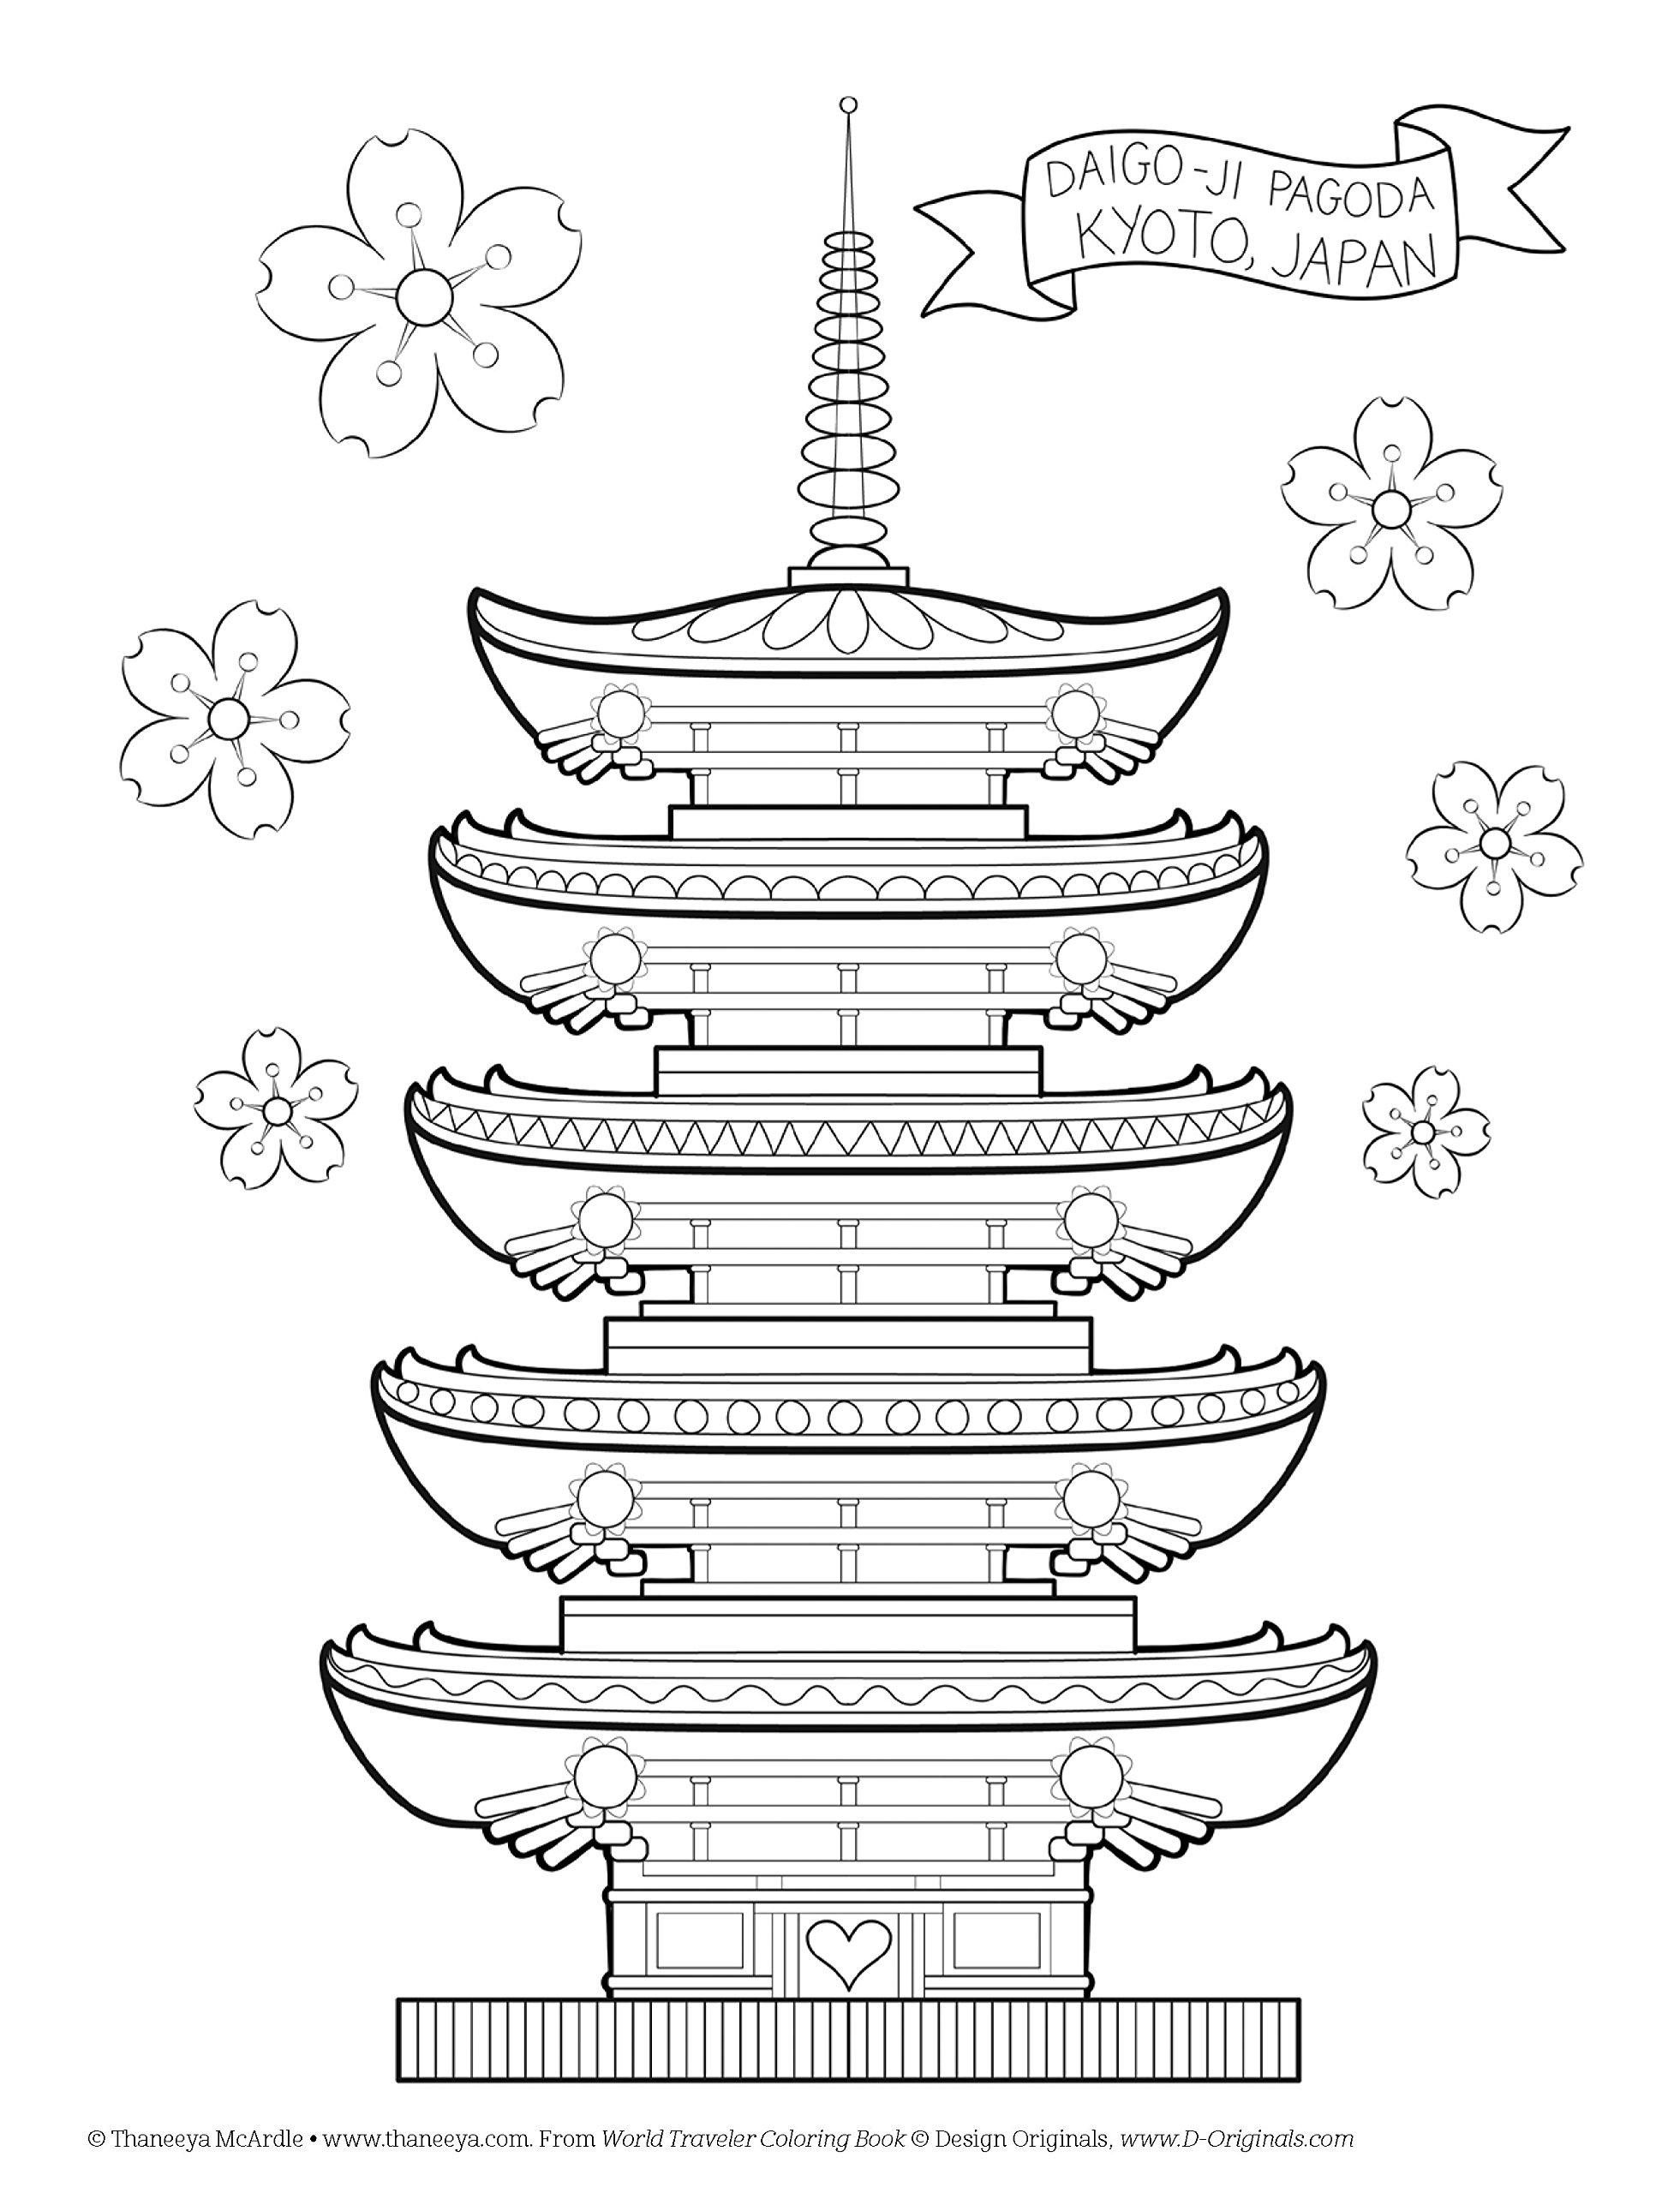 Originals Co Uk Thaneeya Mcardle 0499995279728 Books World Traveler Coloring Book 30 Heritage Sites Design